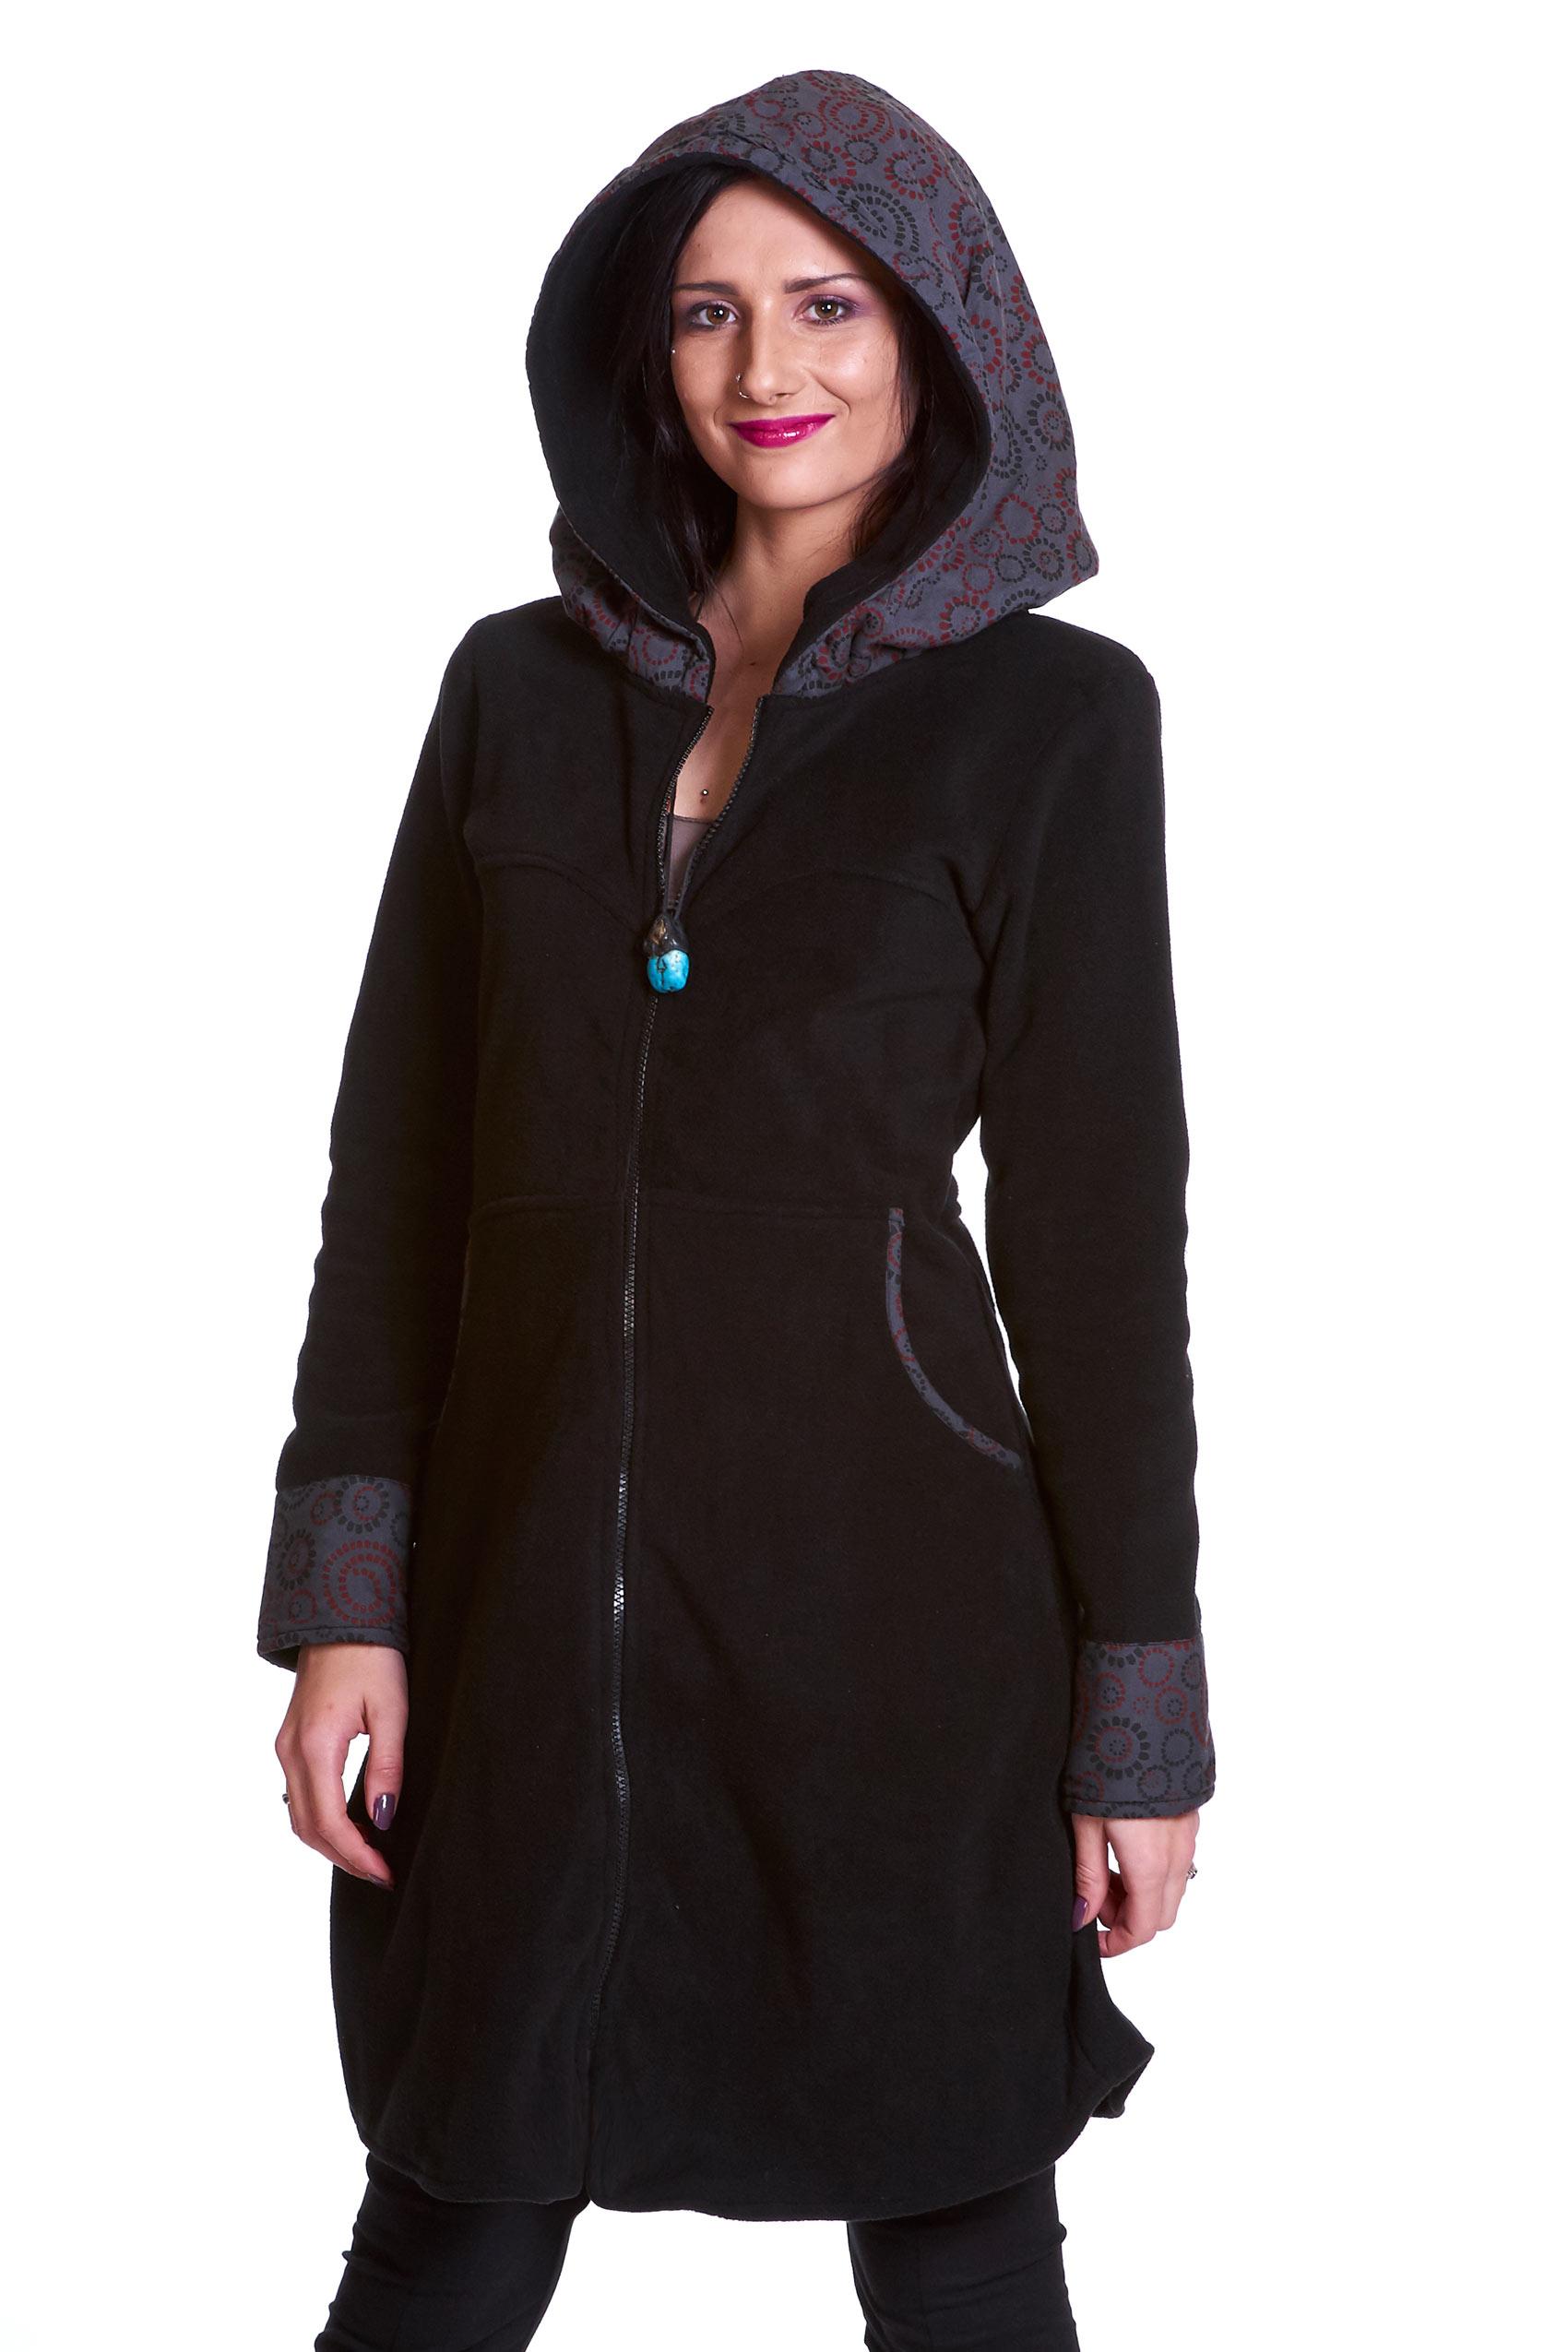 large hooded fleece coat bohemian hippie boho coat altshop uk. Black Bedroom Furniture Sets. Home Design Ideas